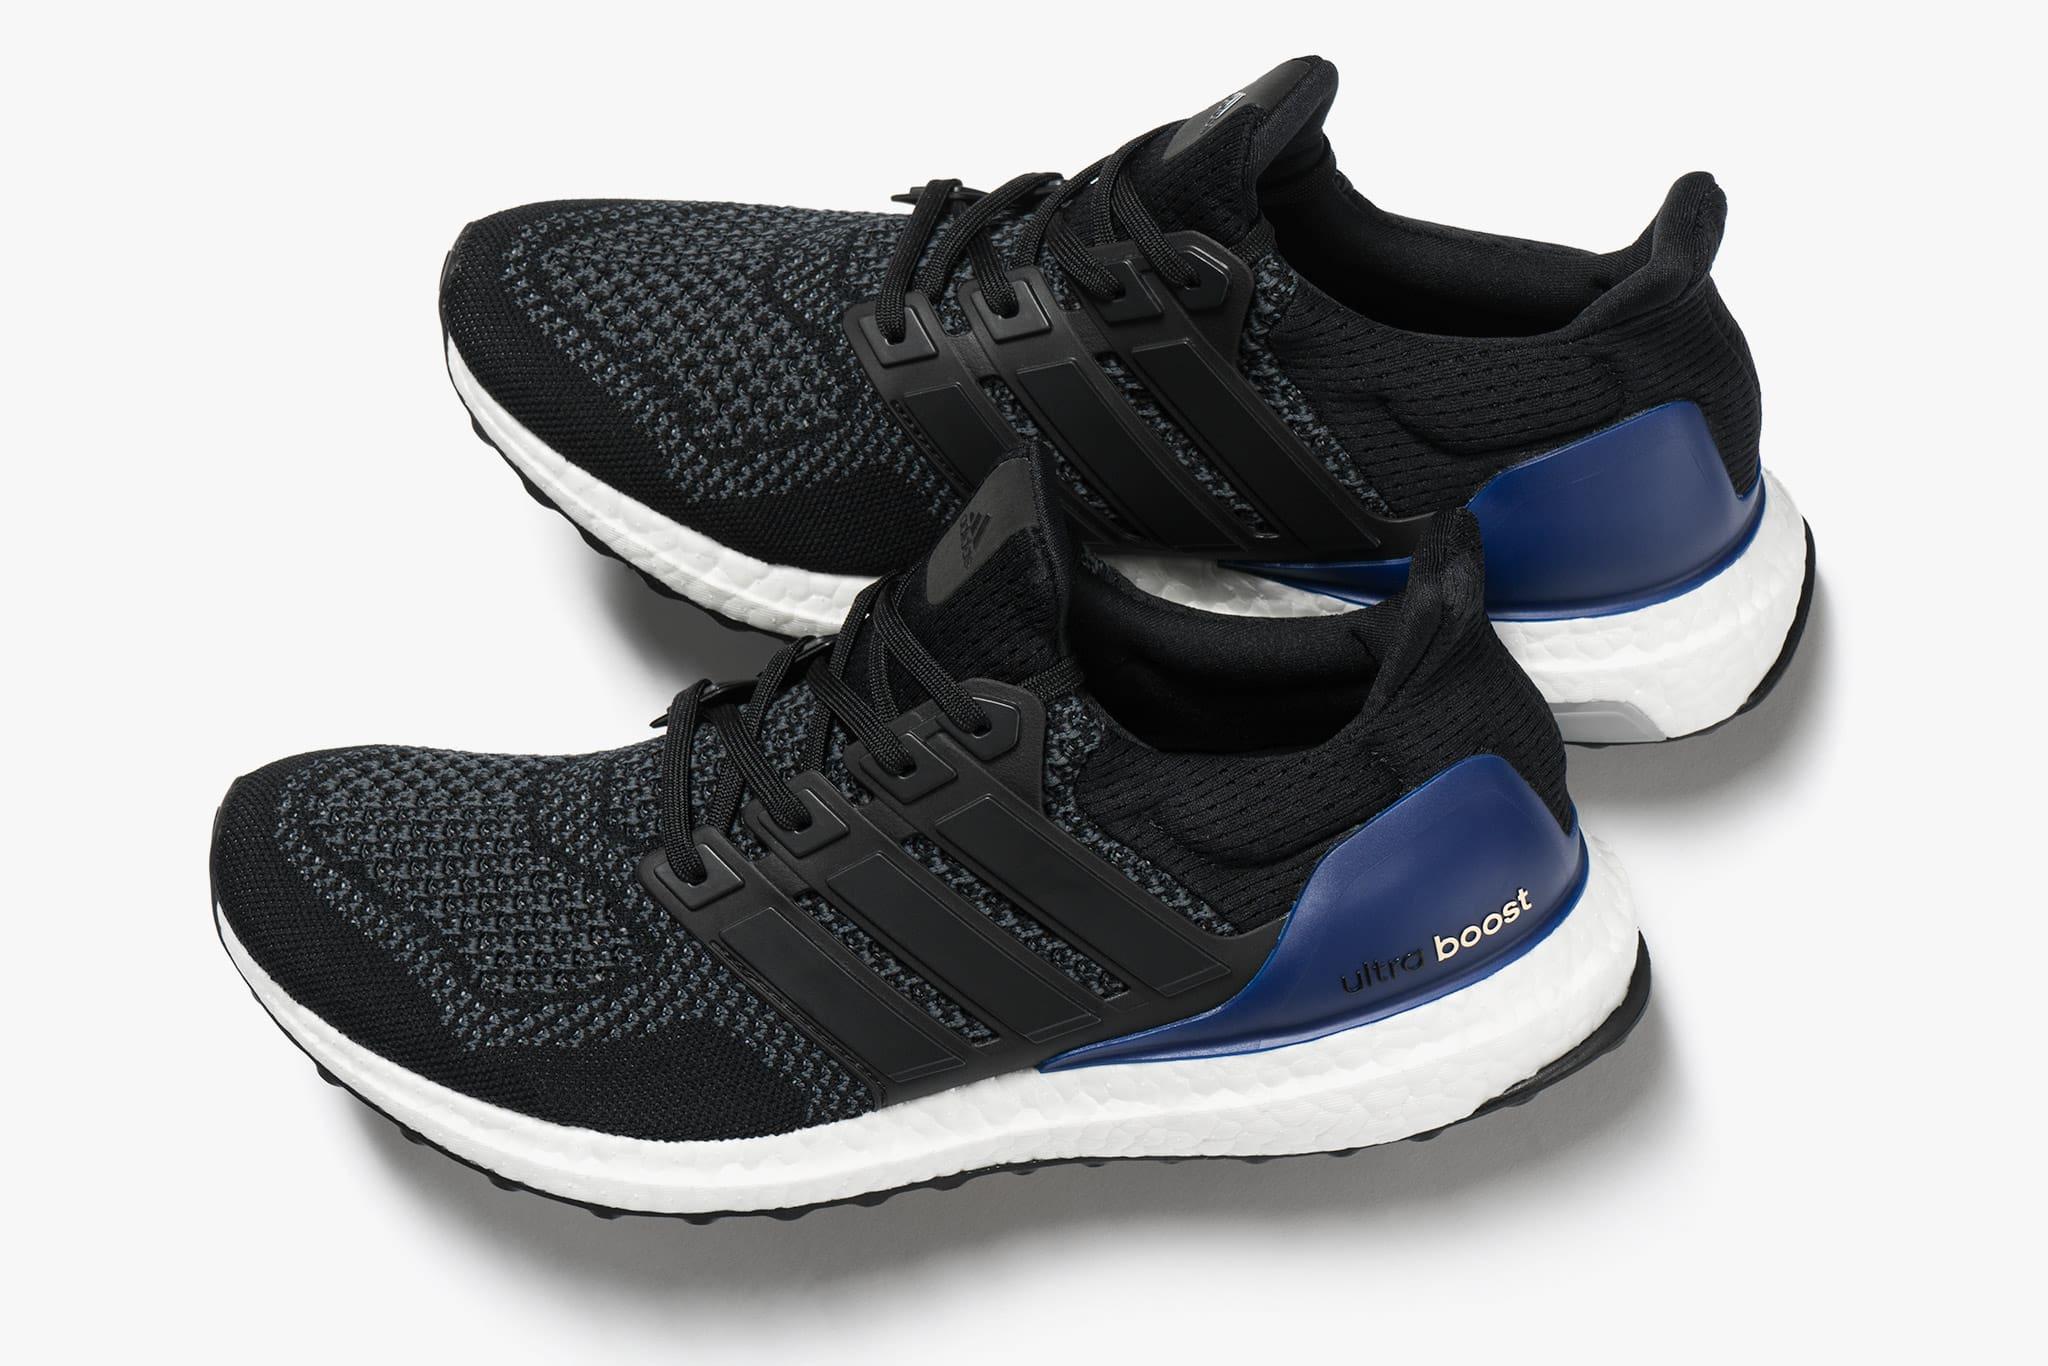 more photos 6e713 60b97 adidas Ultraboost OG Black/Navy | Release Date: 12.01.18 ...